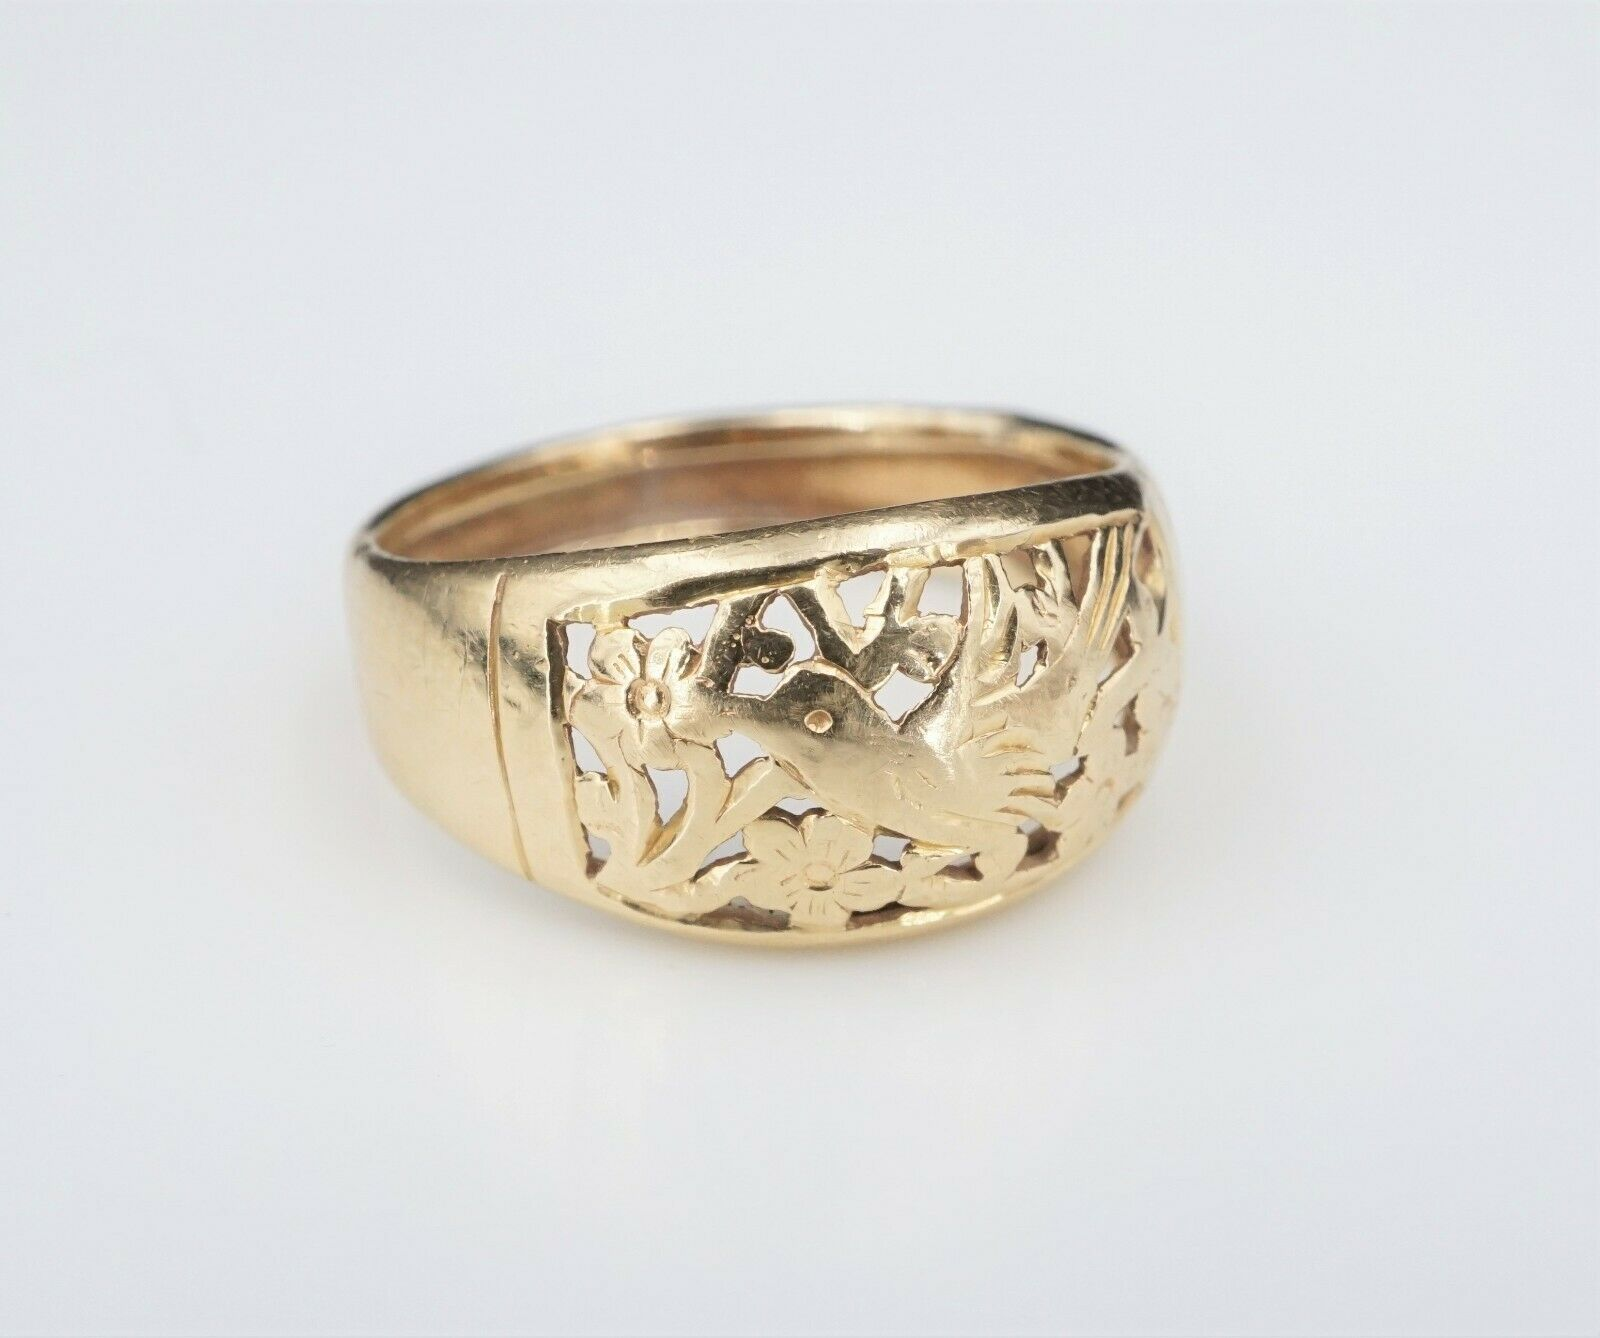 Vintage 14k Yellow Gold MIng s Bird Plum Blossom Ring Size 6.25 RG3077 - $712.31